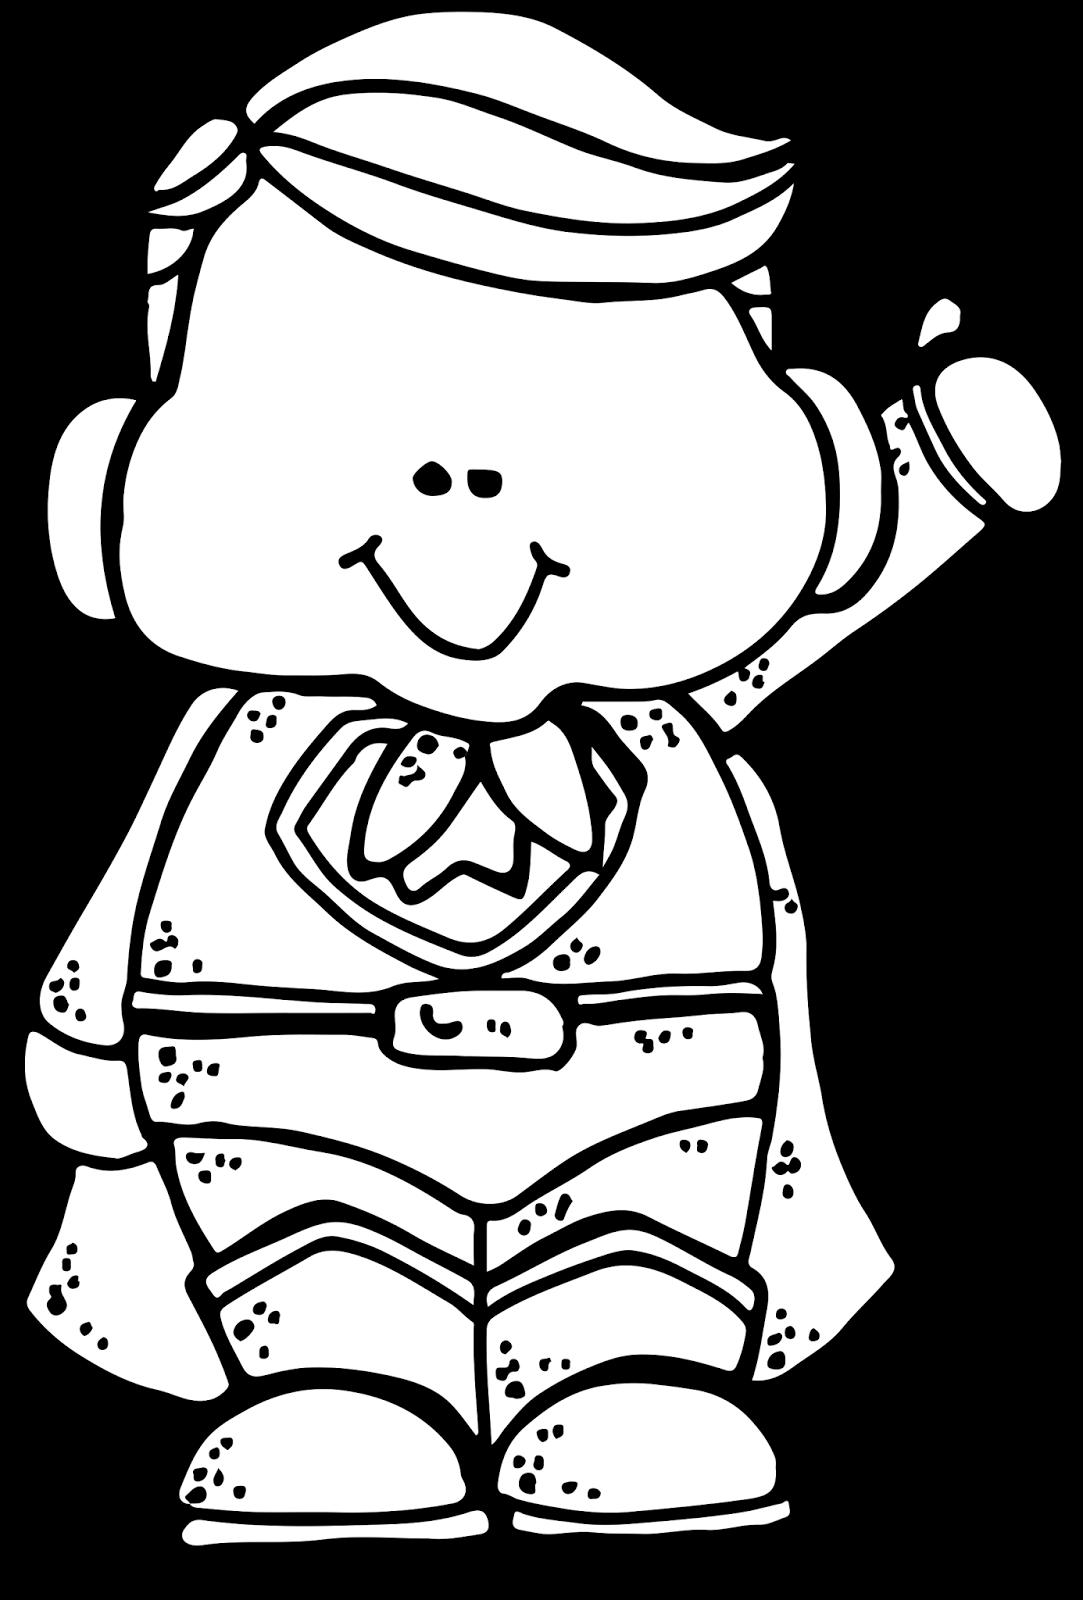 Melonheadz school house clipart black and white clip art freeuse stock MelonHeadz | Digi Stamps - Melonheadz | Pinterest | Digi stamps, Met ... clip art freeuse stock